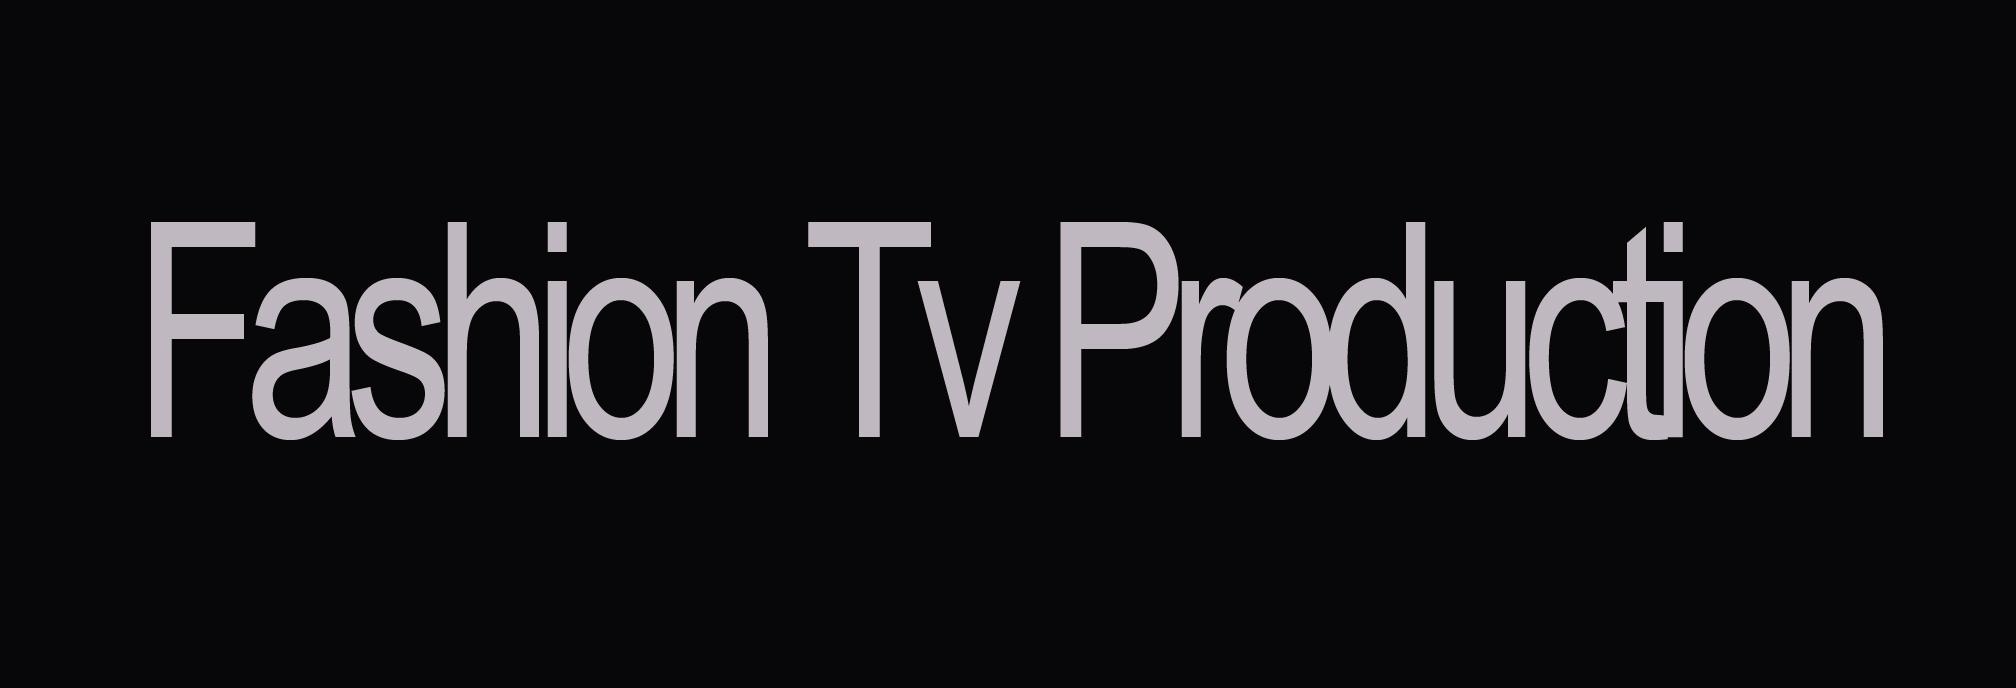 fashion tv production